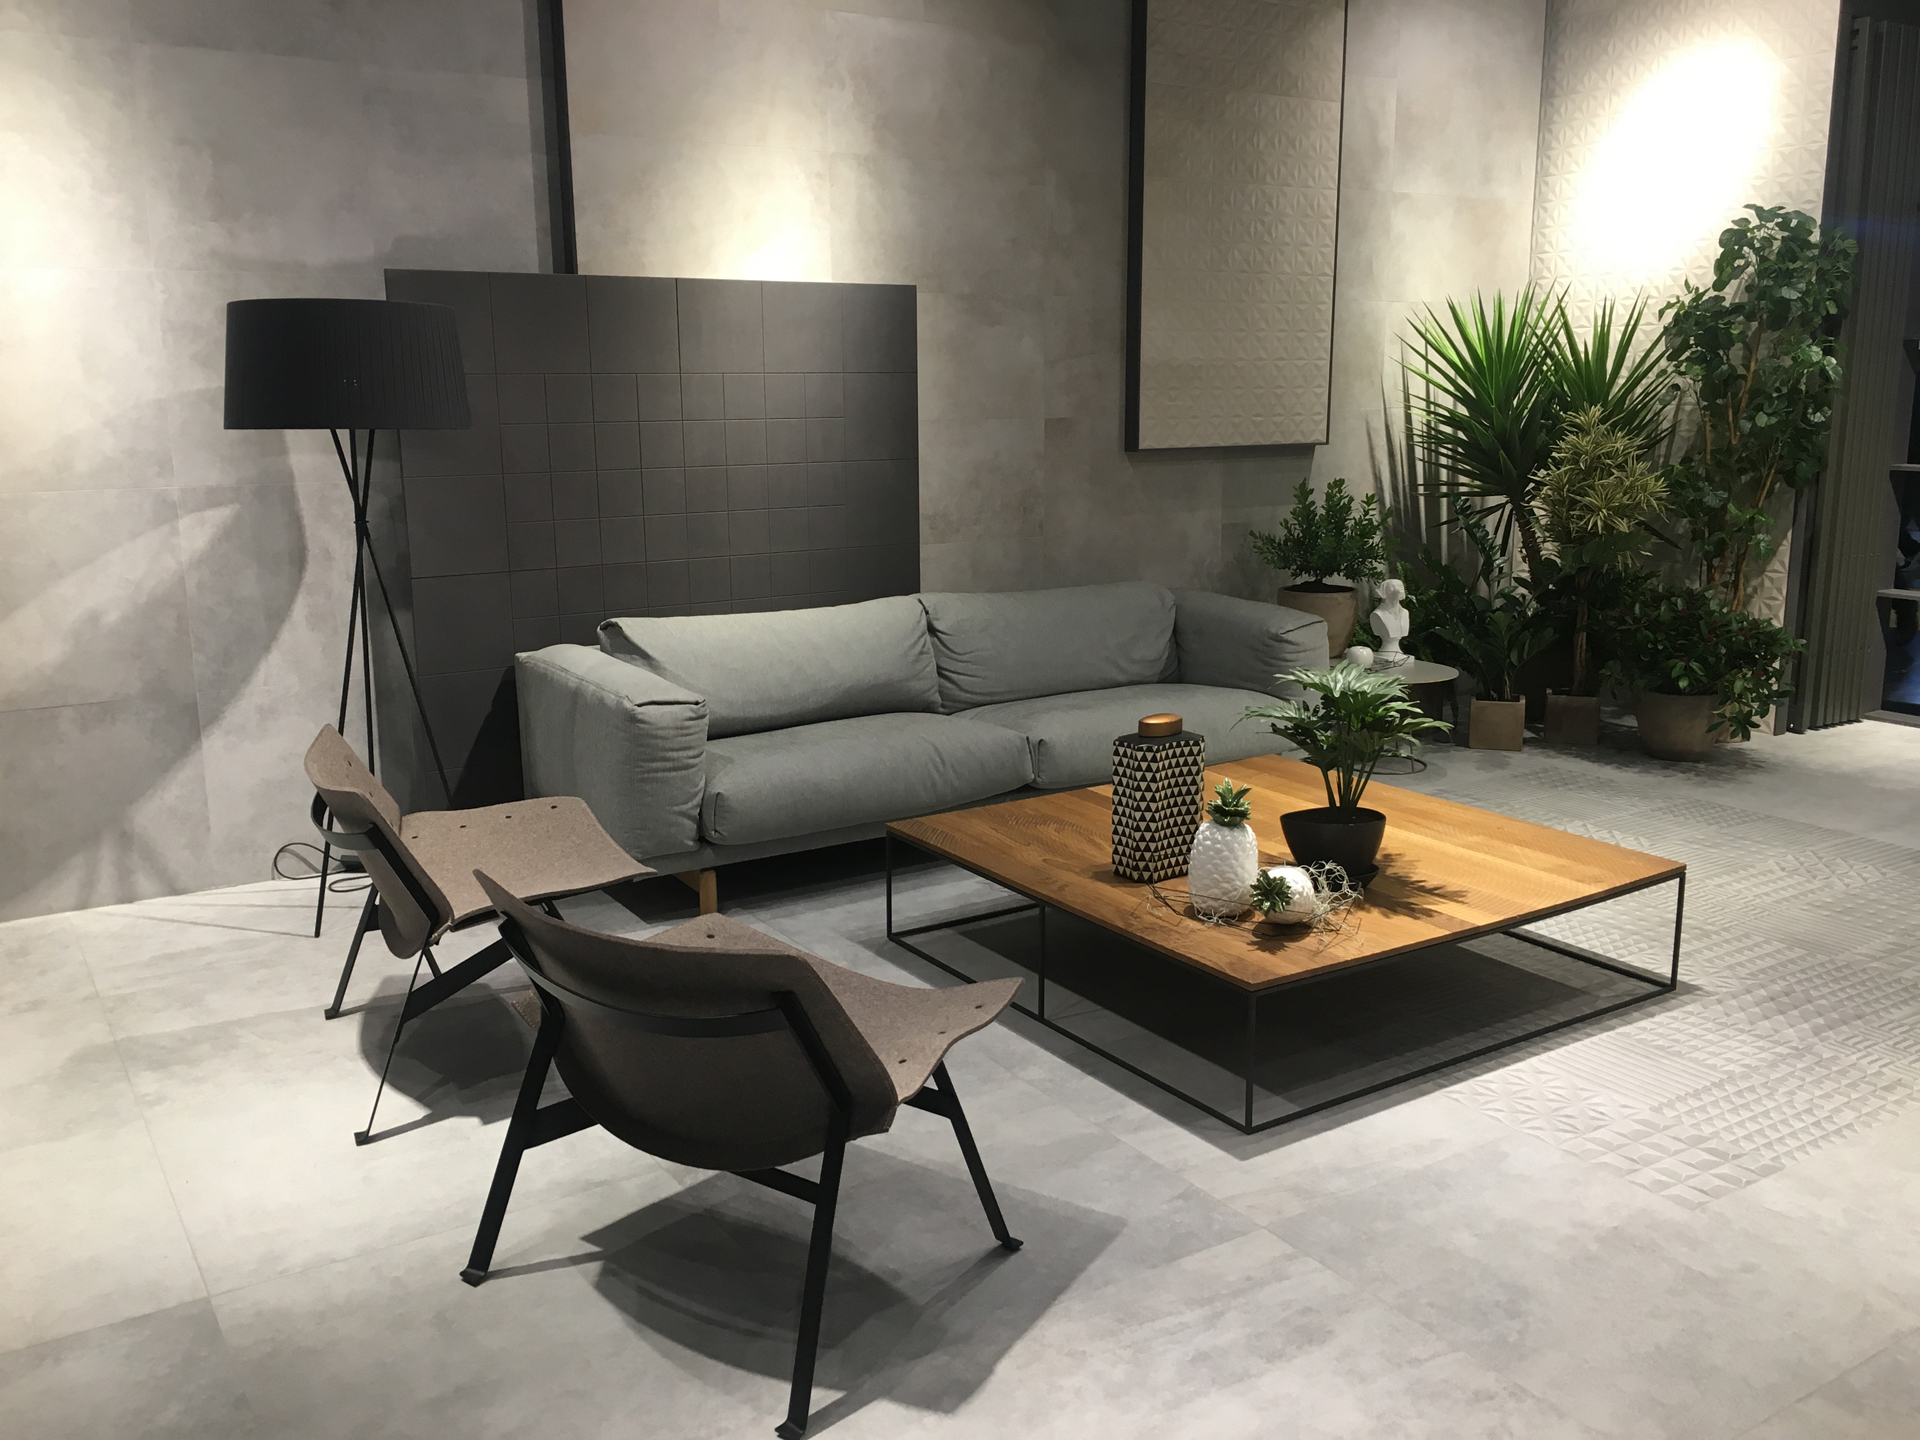 feria-cevisama-valencia-2018-decoracion-interiorismo-5